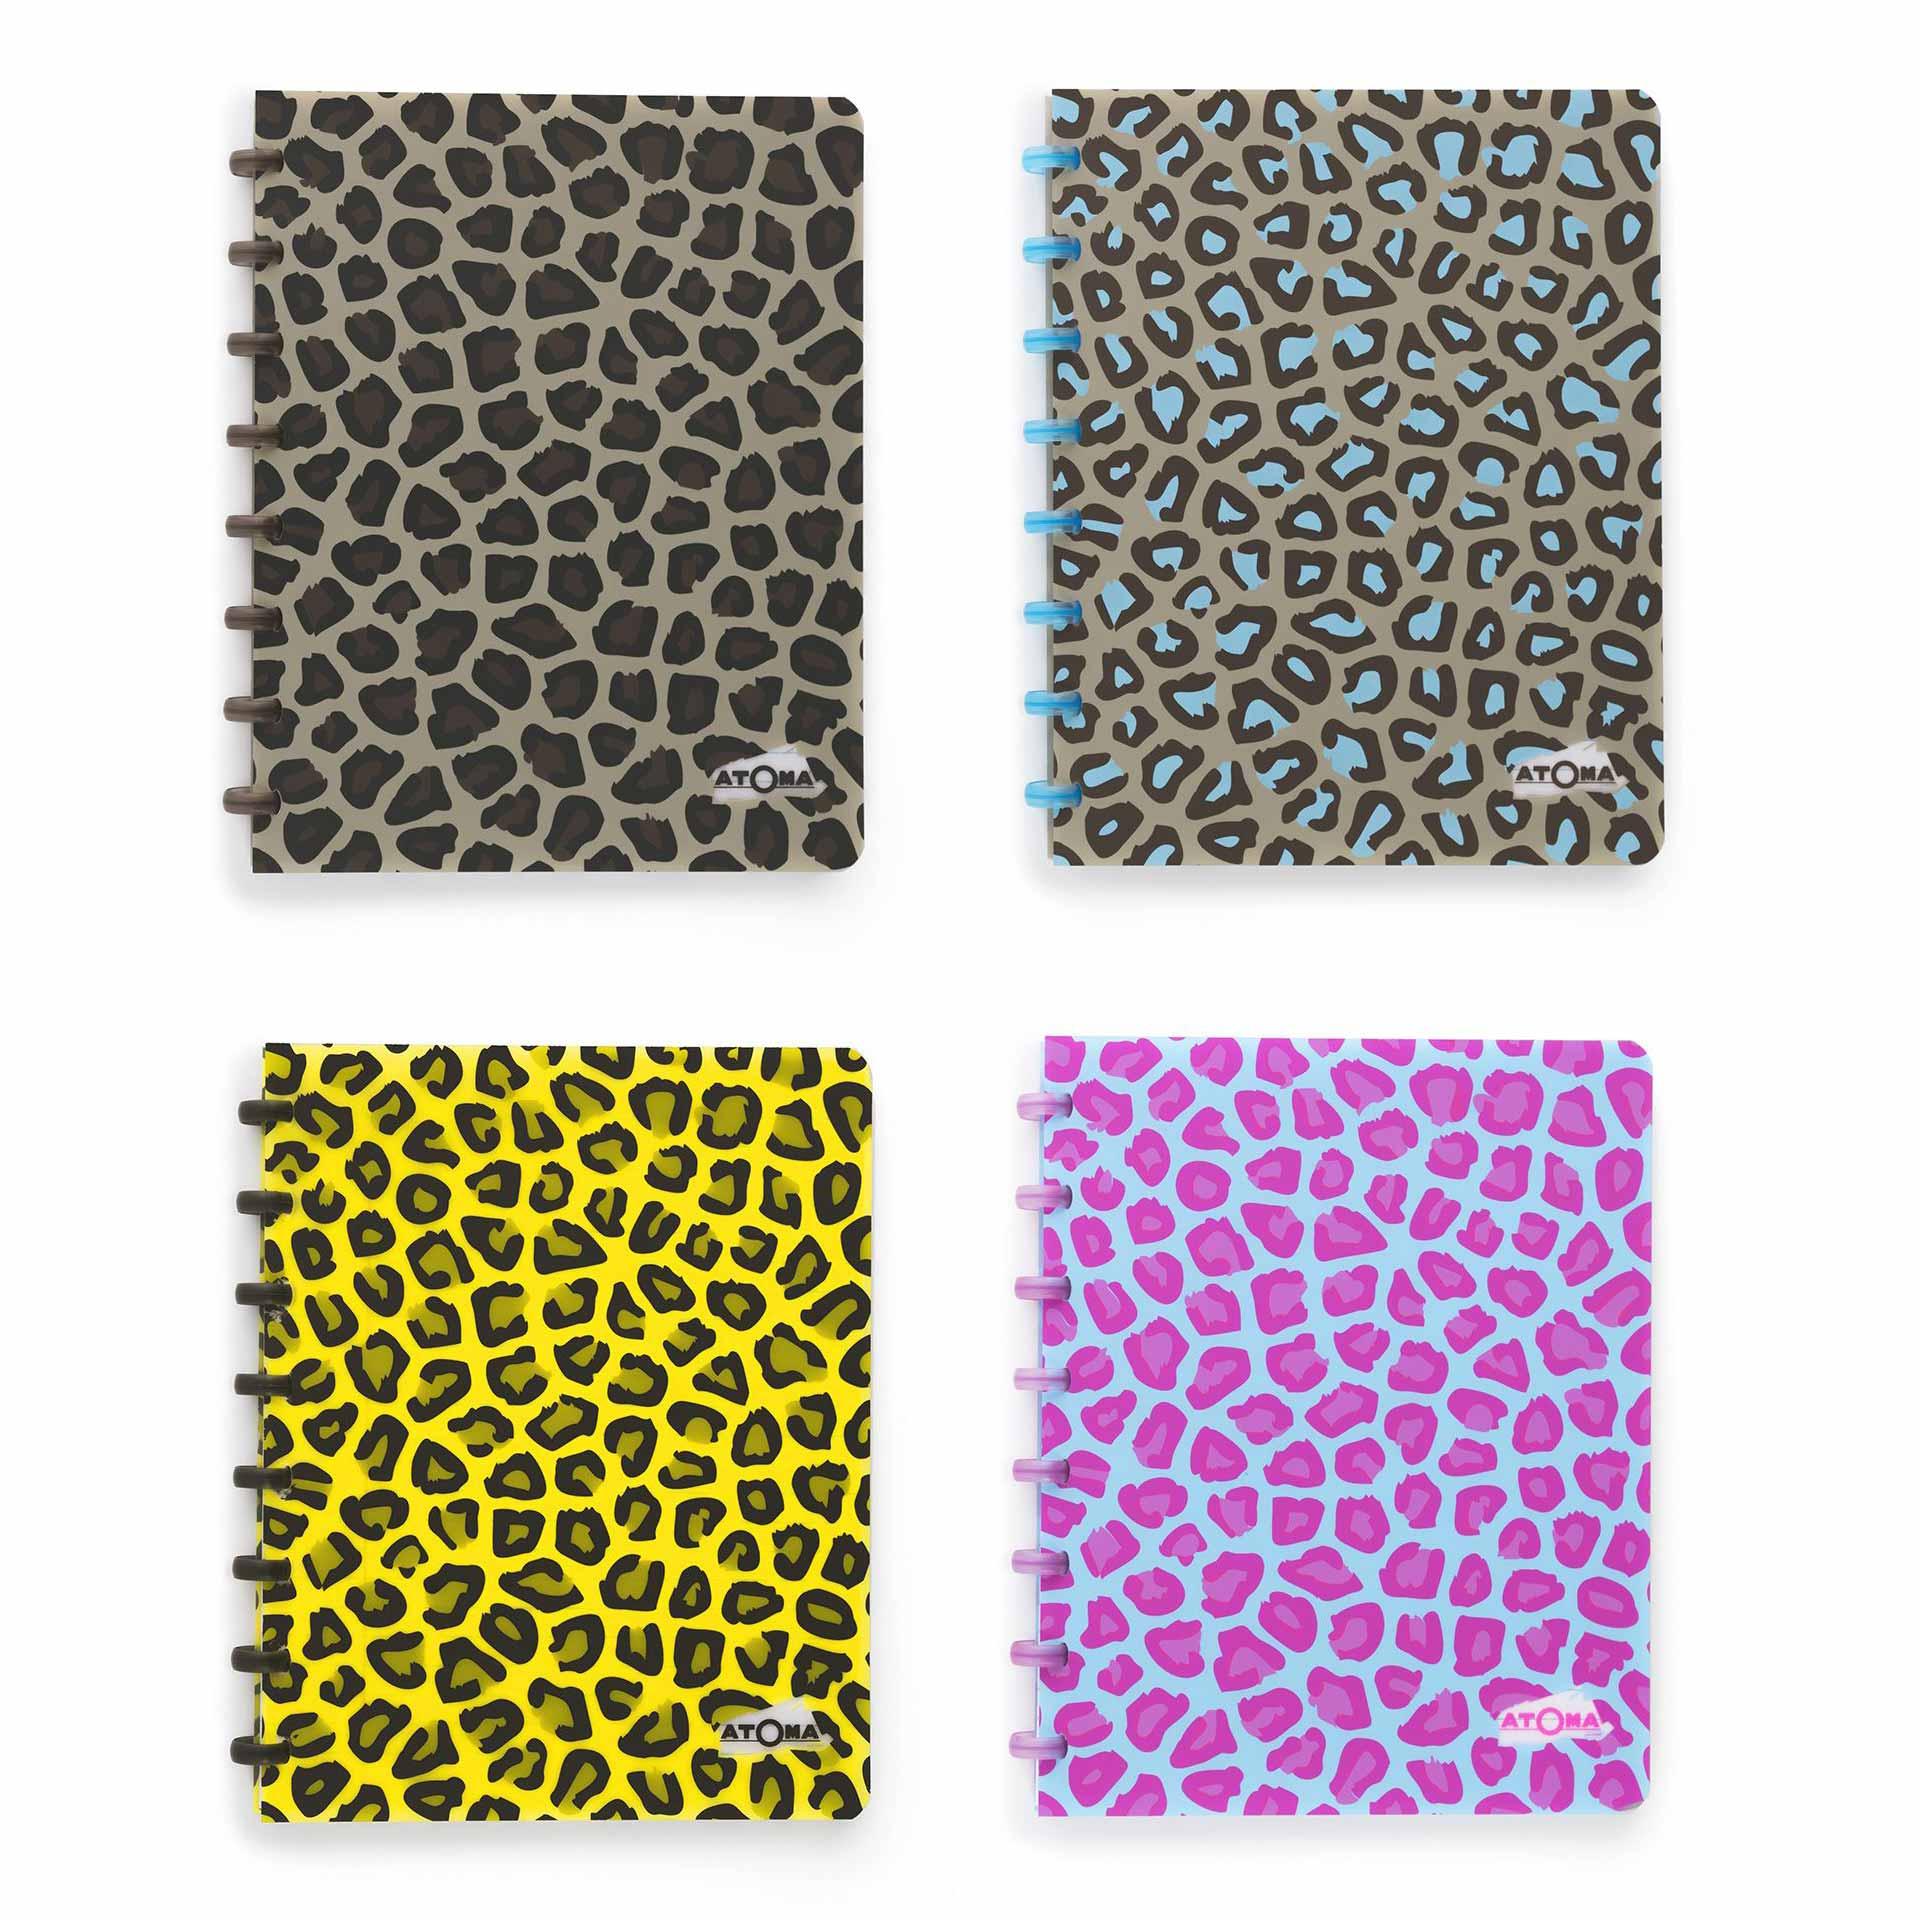 Atoma Leopard Graphics design CASINI STUDIO